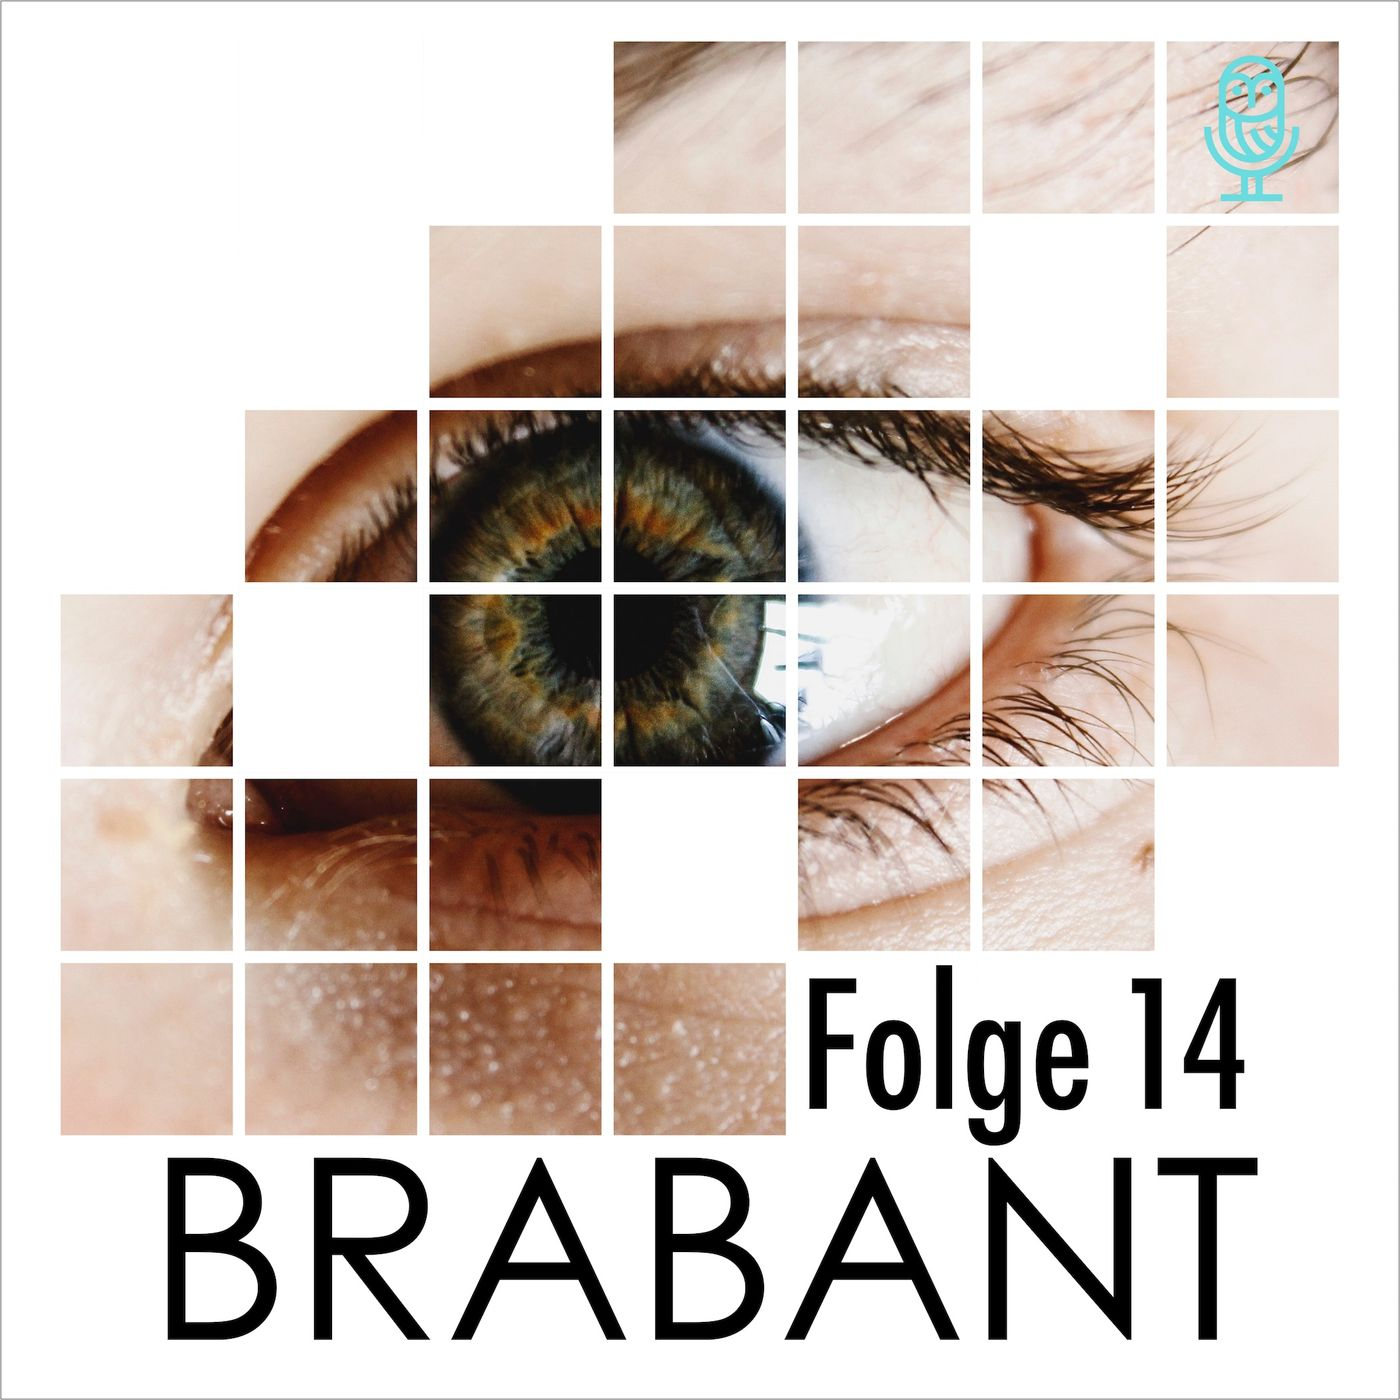 Folge 14: Die Brabant Mörder (4/6)